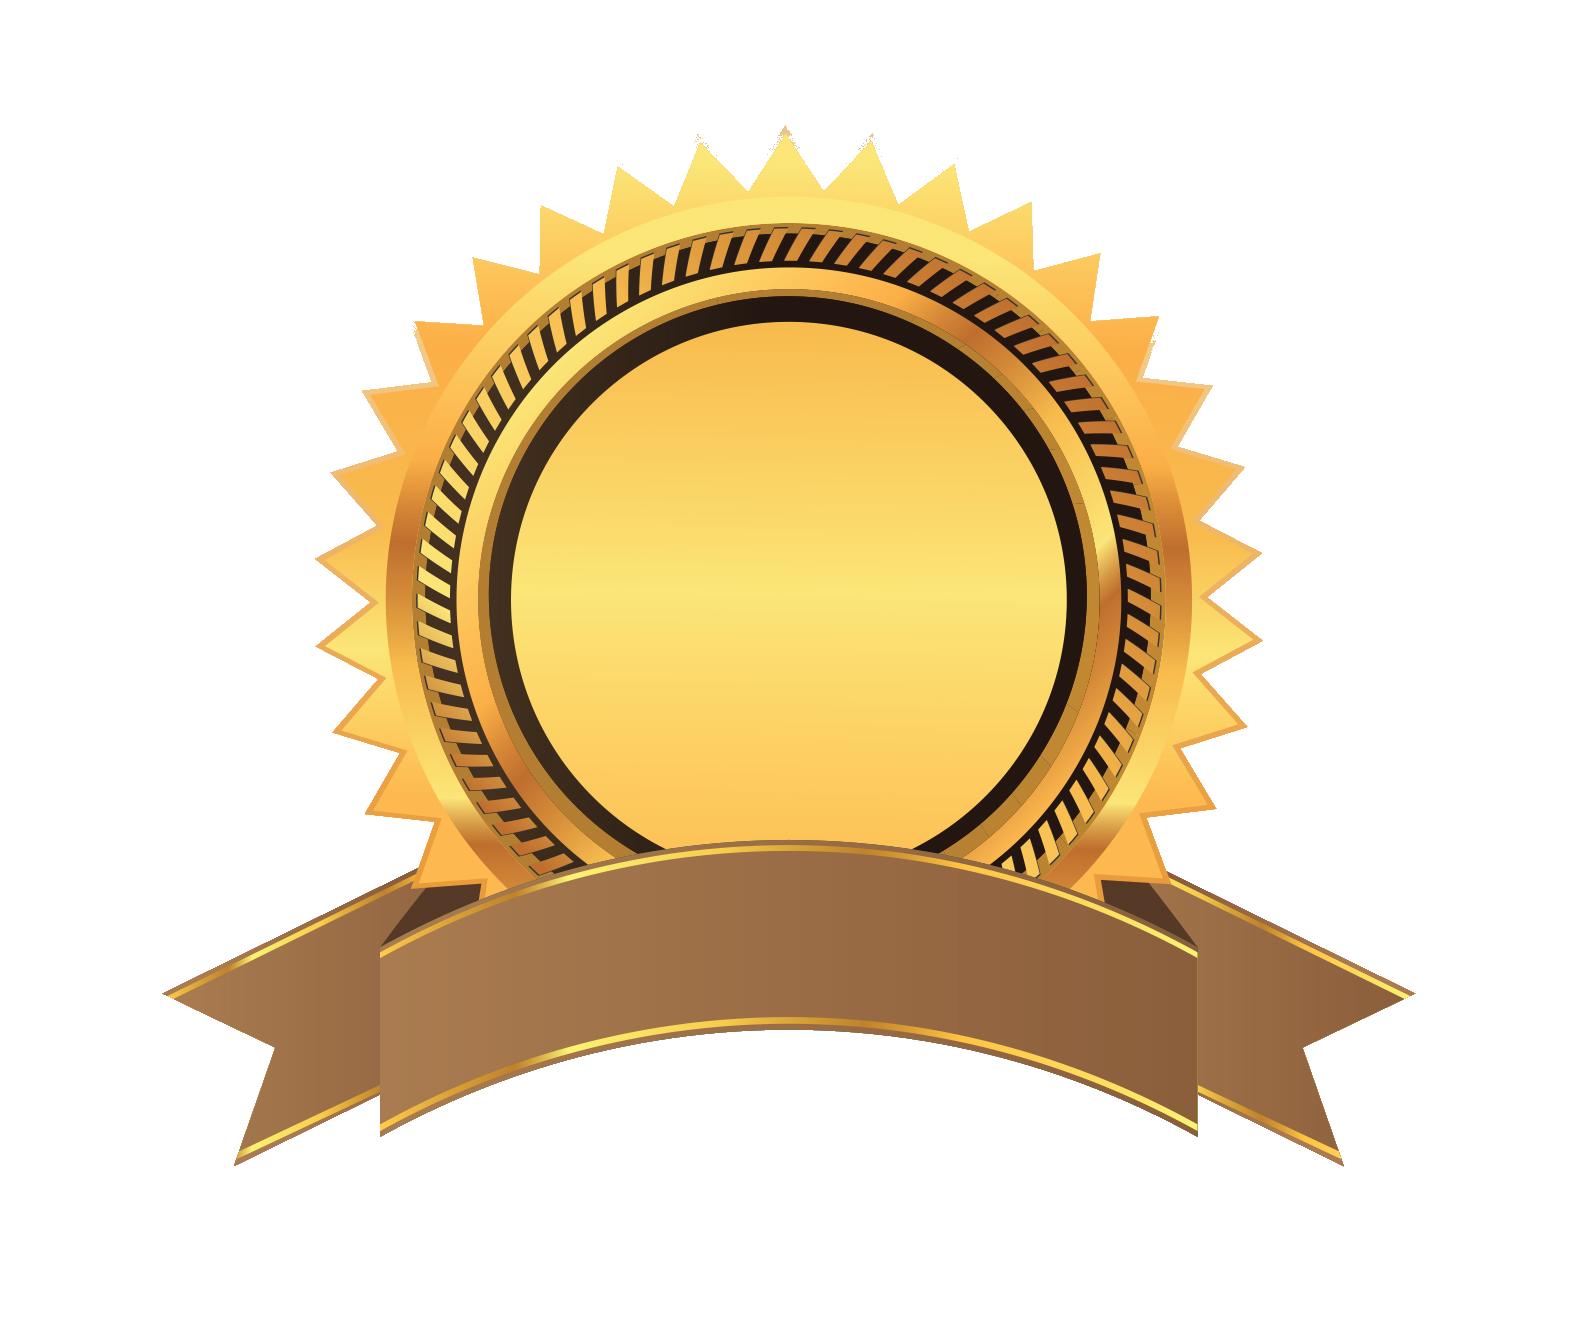 Award PNG Photos PNG Mart Lamp logo, Png photo, Vector